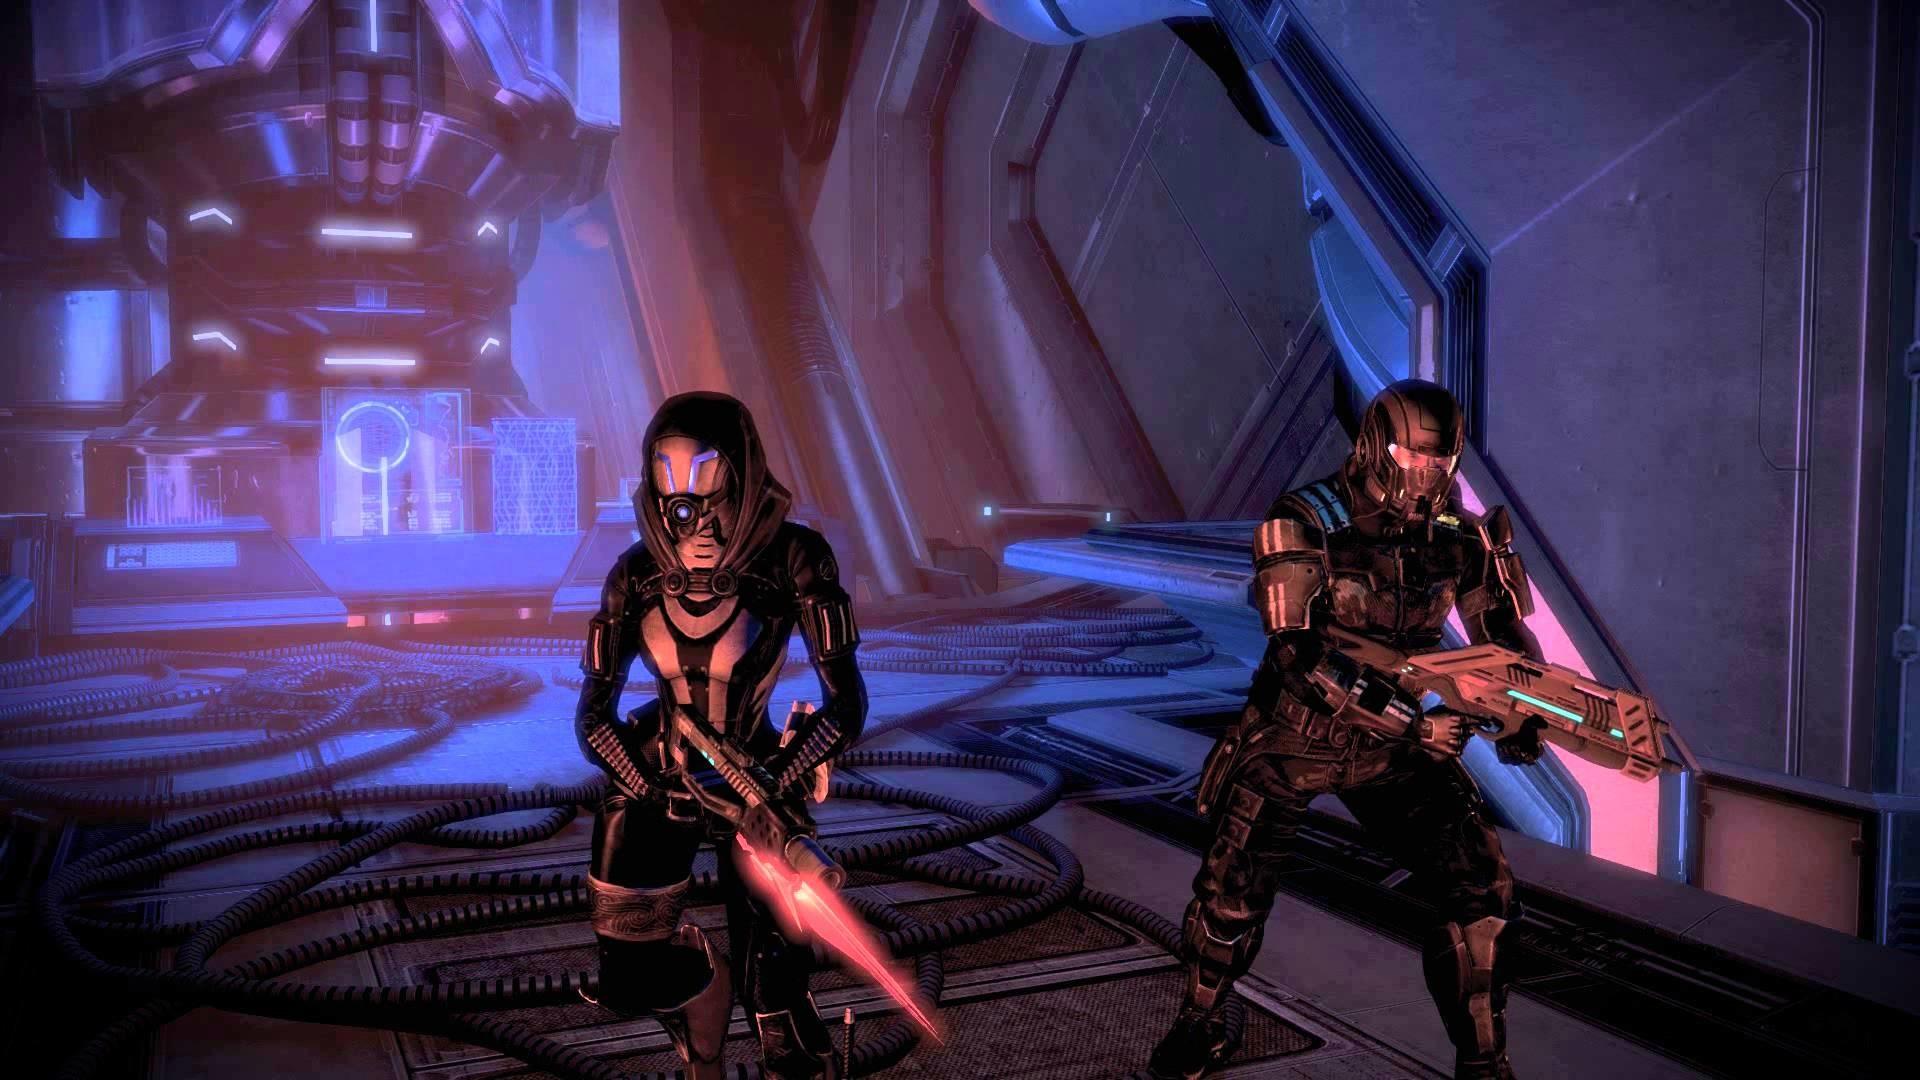 Mass Effect 3 Tali and Kaiden Ready for Battle Dreamscene Video Wallpaper